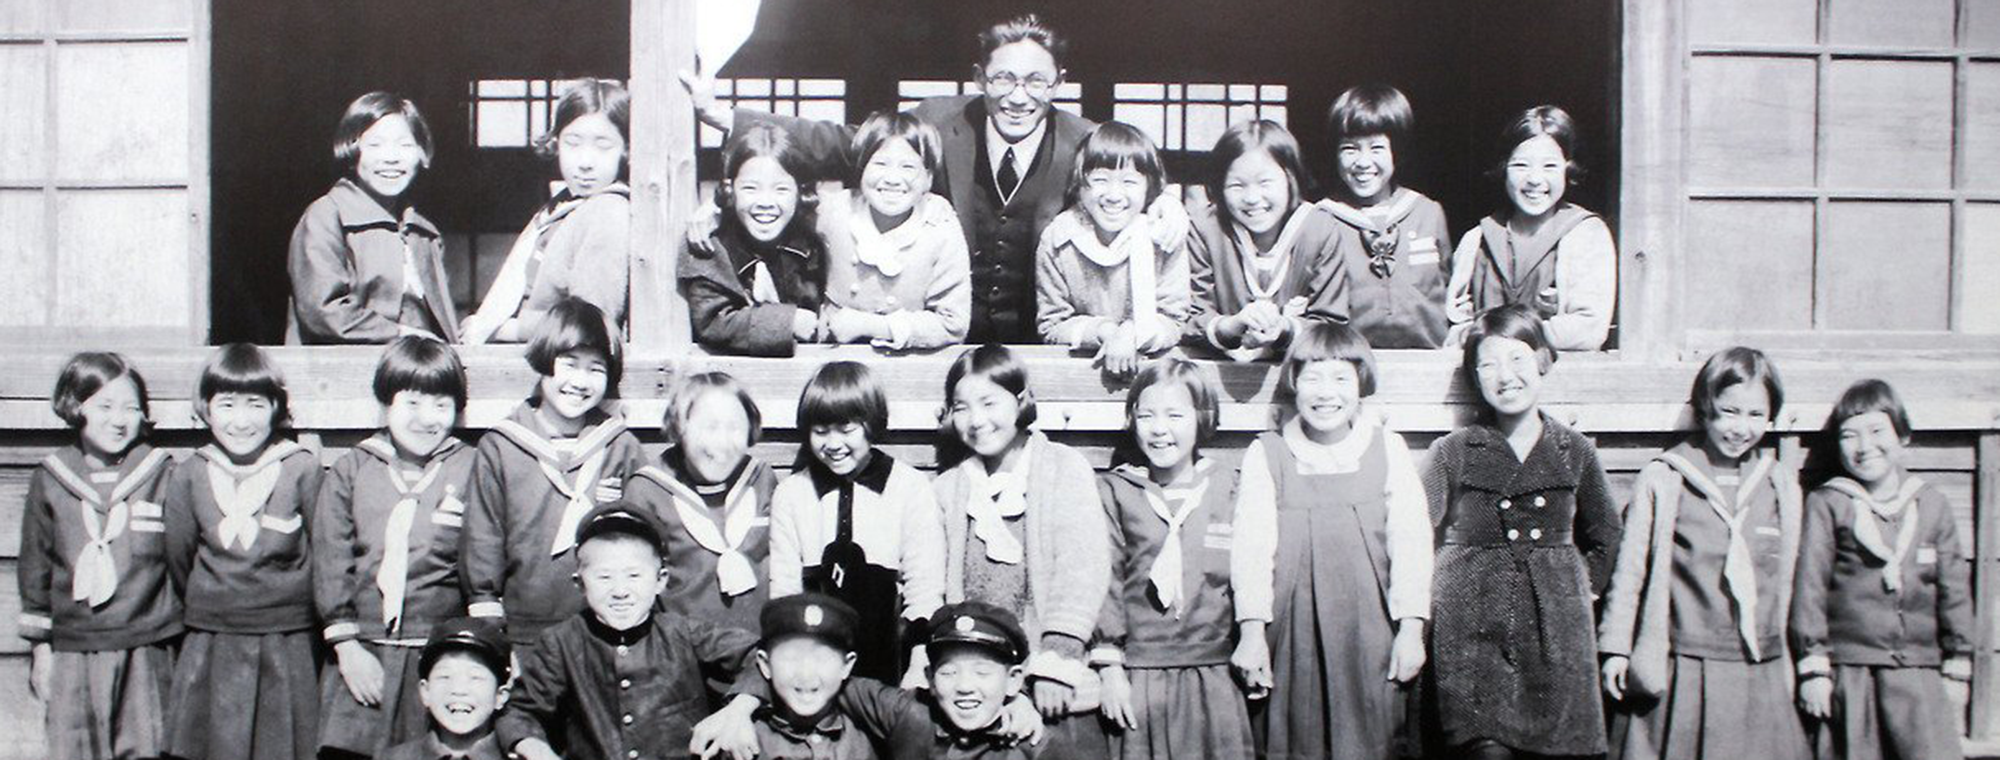 Teacher and students of the Noboricho Elementary School, located 0.7 mi / 1.1 km from ground zero